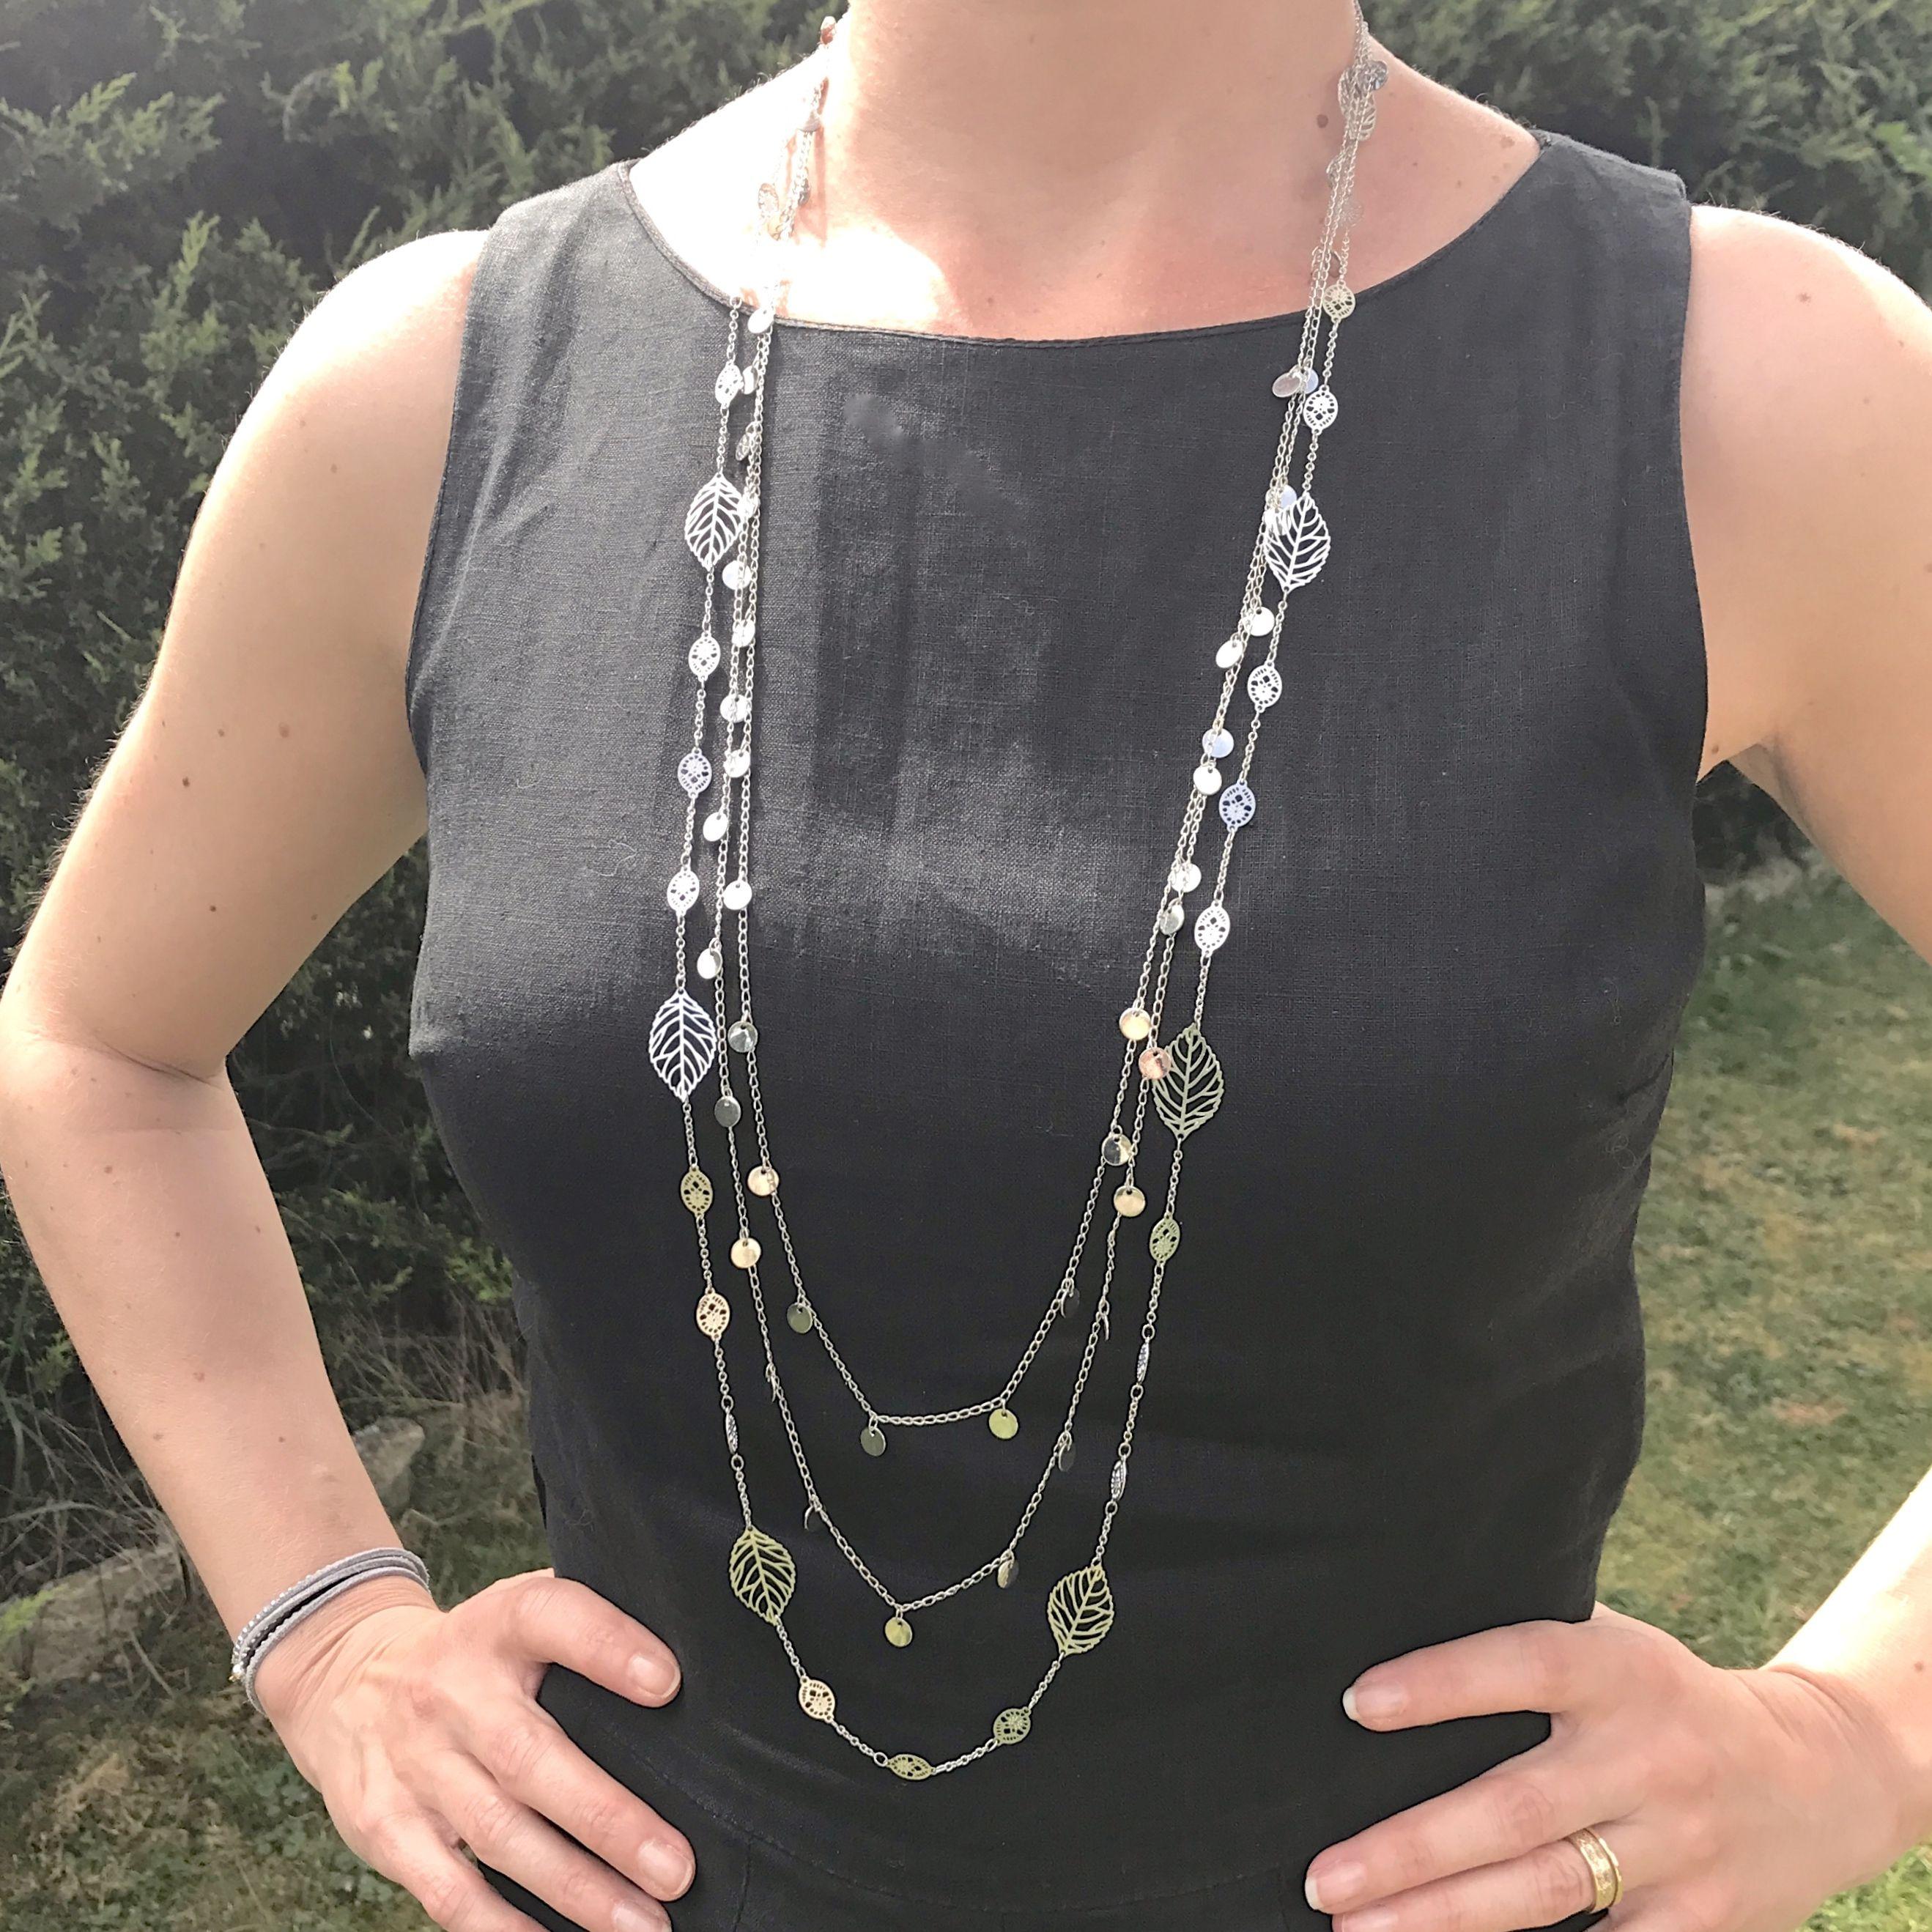 Crystal Chunky Statement Bib Pampilles Feuilles Pendentif Chaîne Fashion Collier Tour de cou